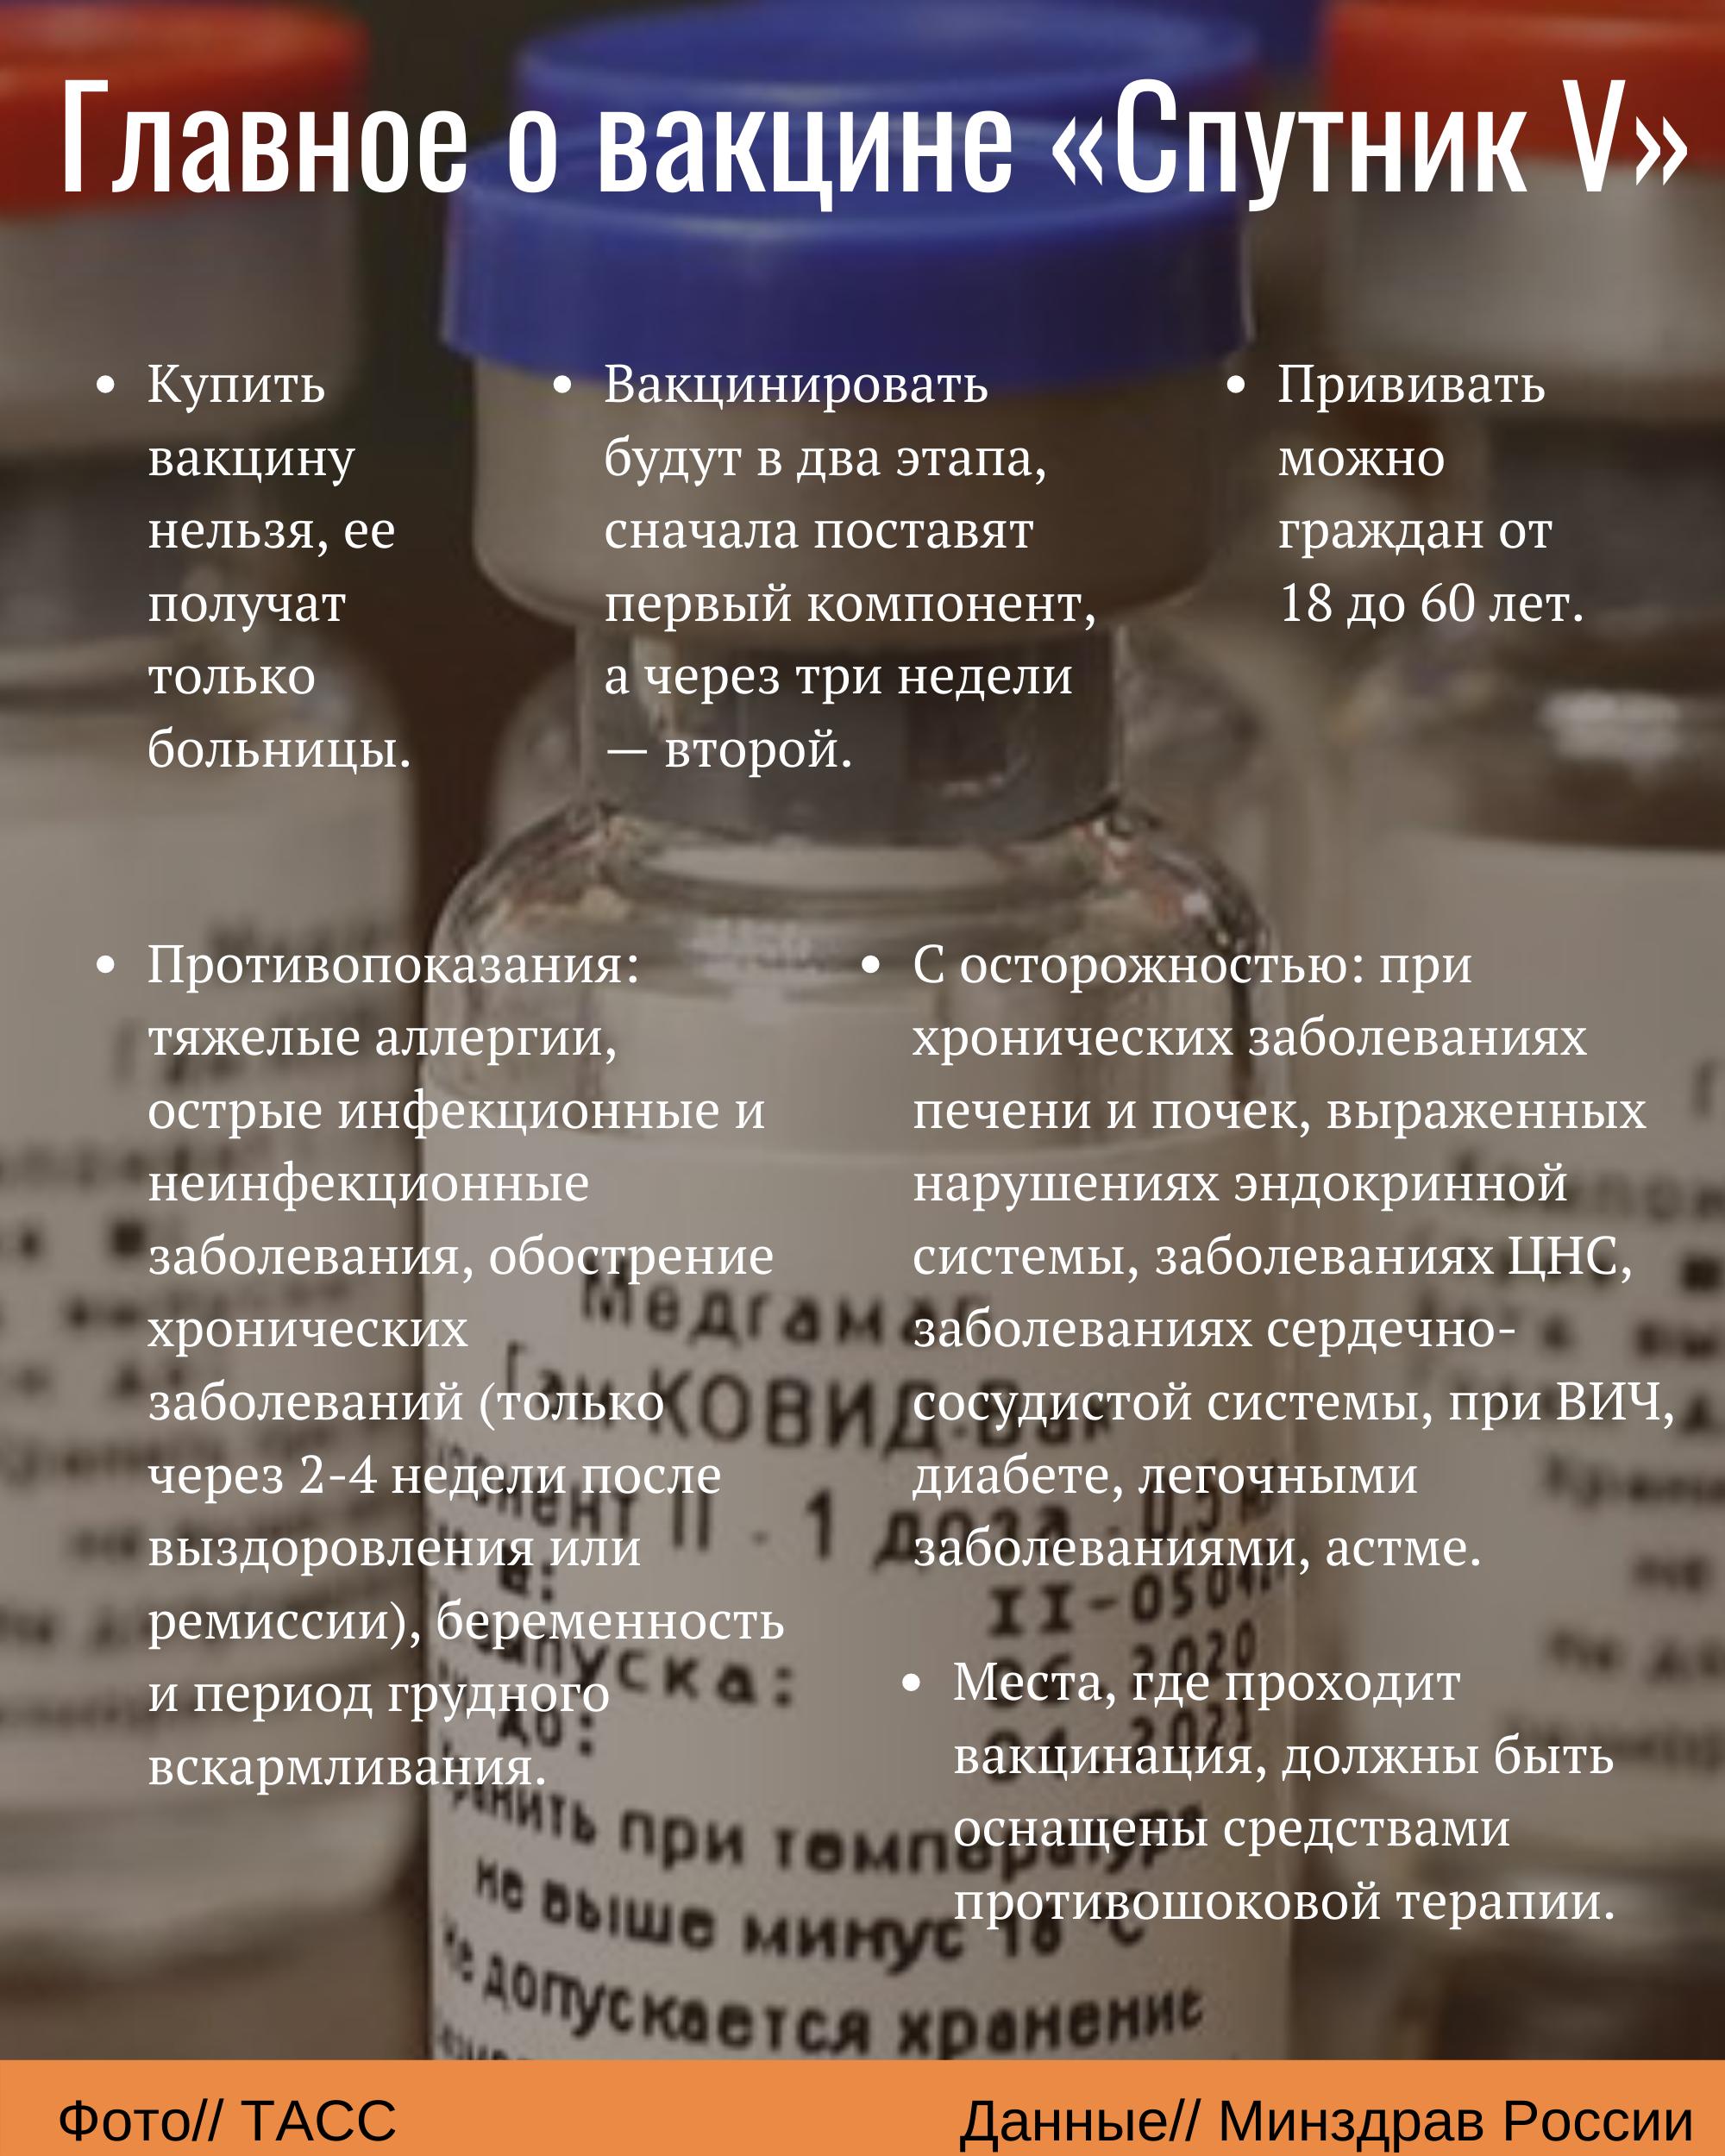 Glavnoe-o-vaktsine-Sputnik-V